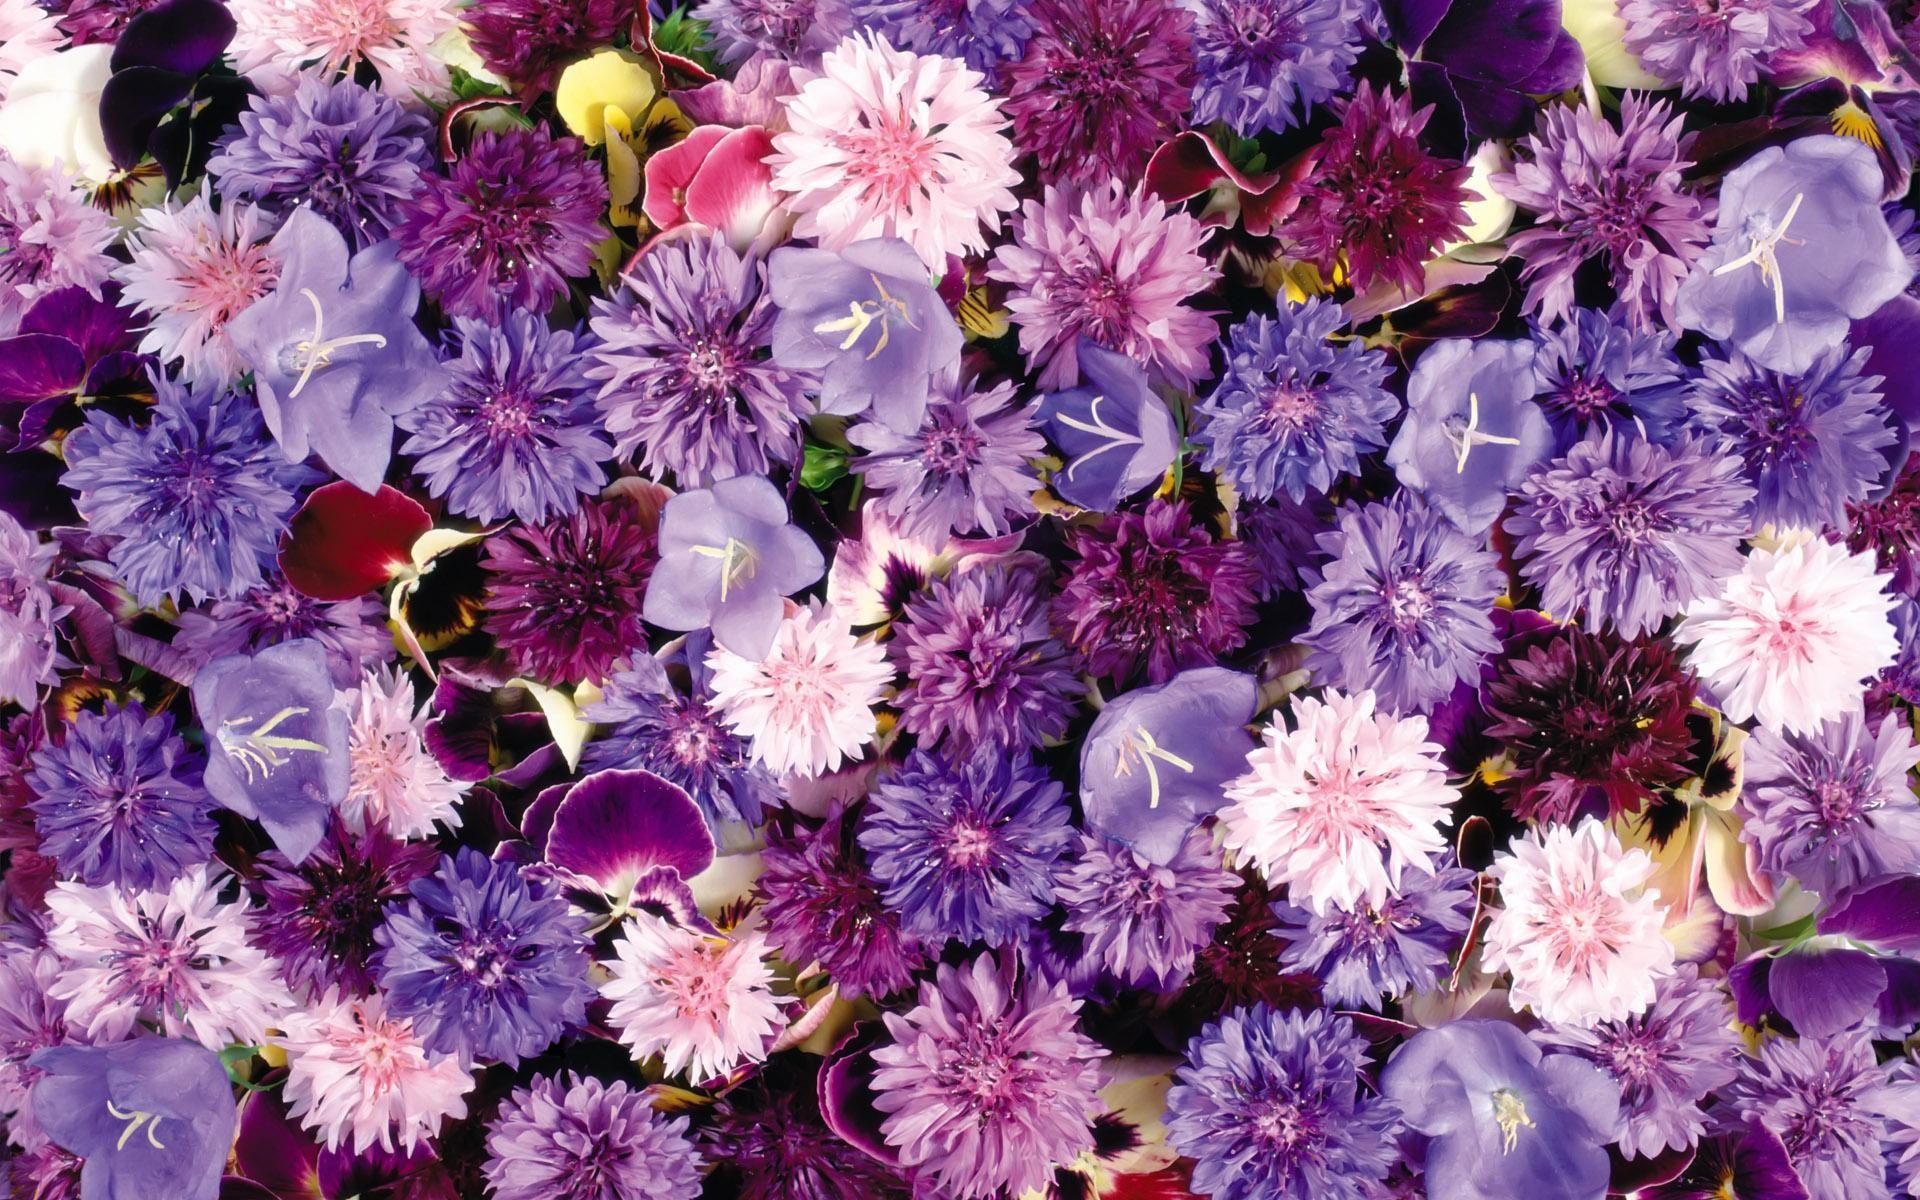 Full Hd Of Lots Violet Flowers Screen Wallpaper Flower Flower Aesthetic Purple Background 297522 Hd Wallpaper Backgrounds Download